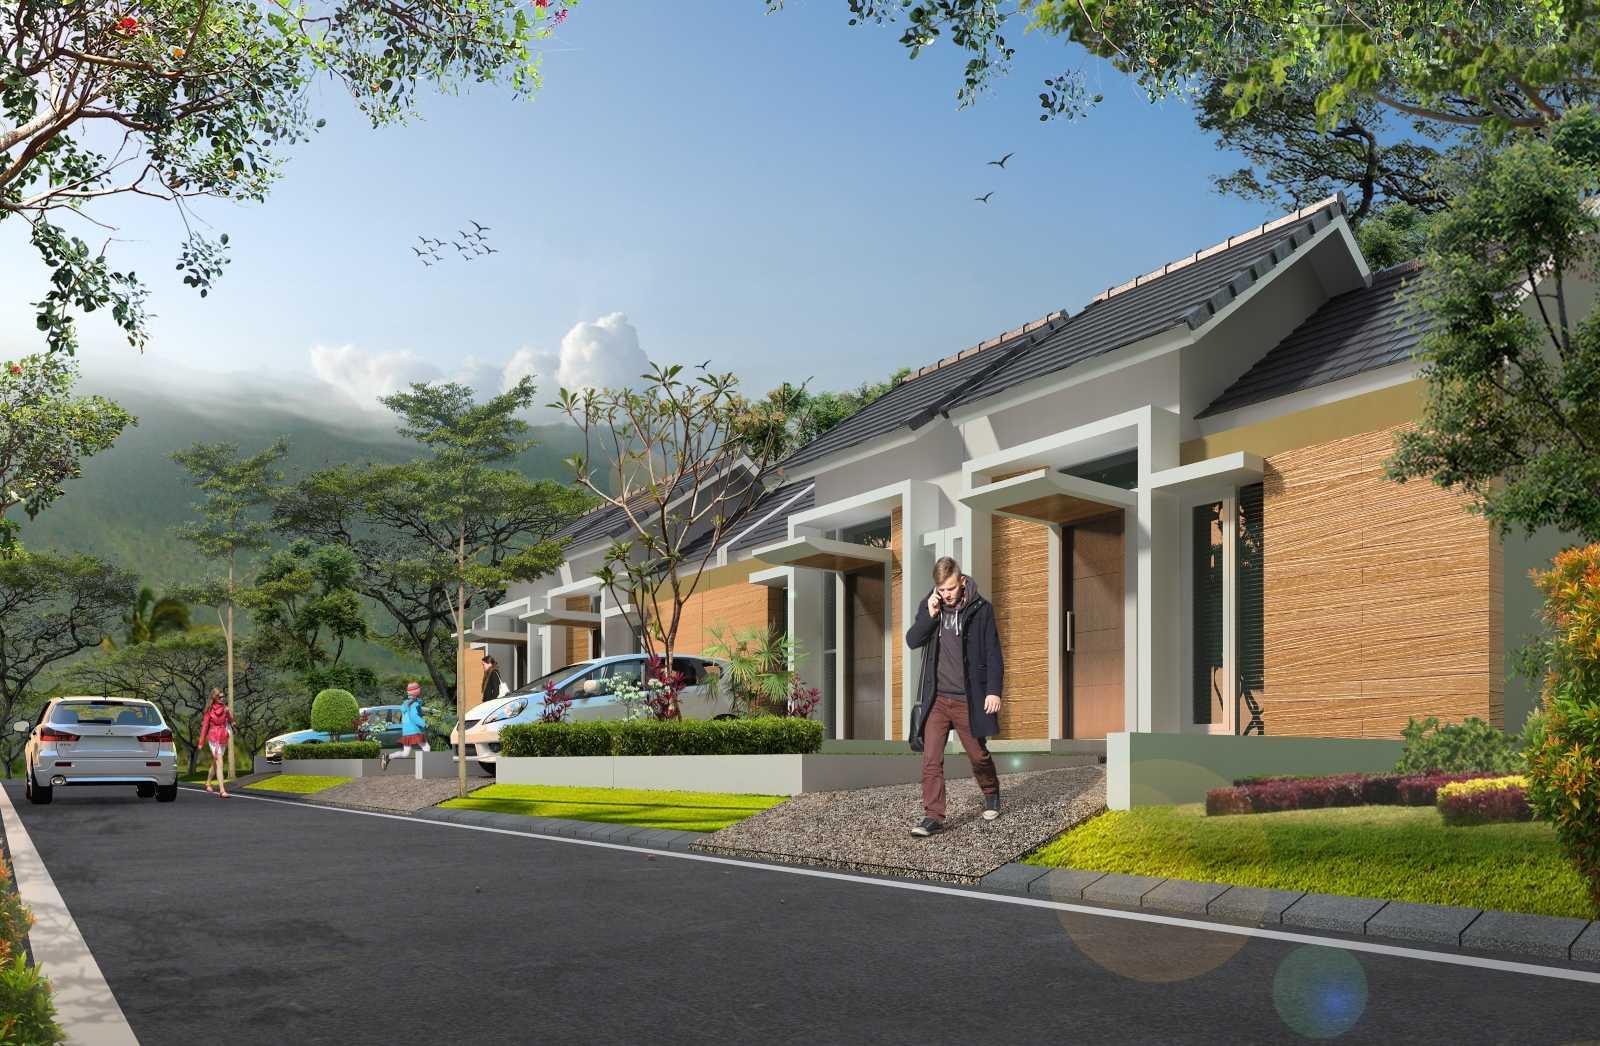 Satuvista Architect Taman Beverly Residence  Samarinda, Kota Samarinda, Kalimantan Timur, Indonesia Samarinda, Kota Samarinda, Kalimantan Timur, Indonesia Exterior View Minimalis  50517